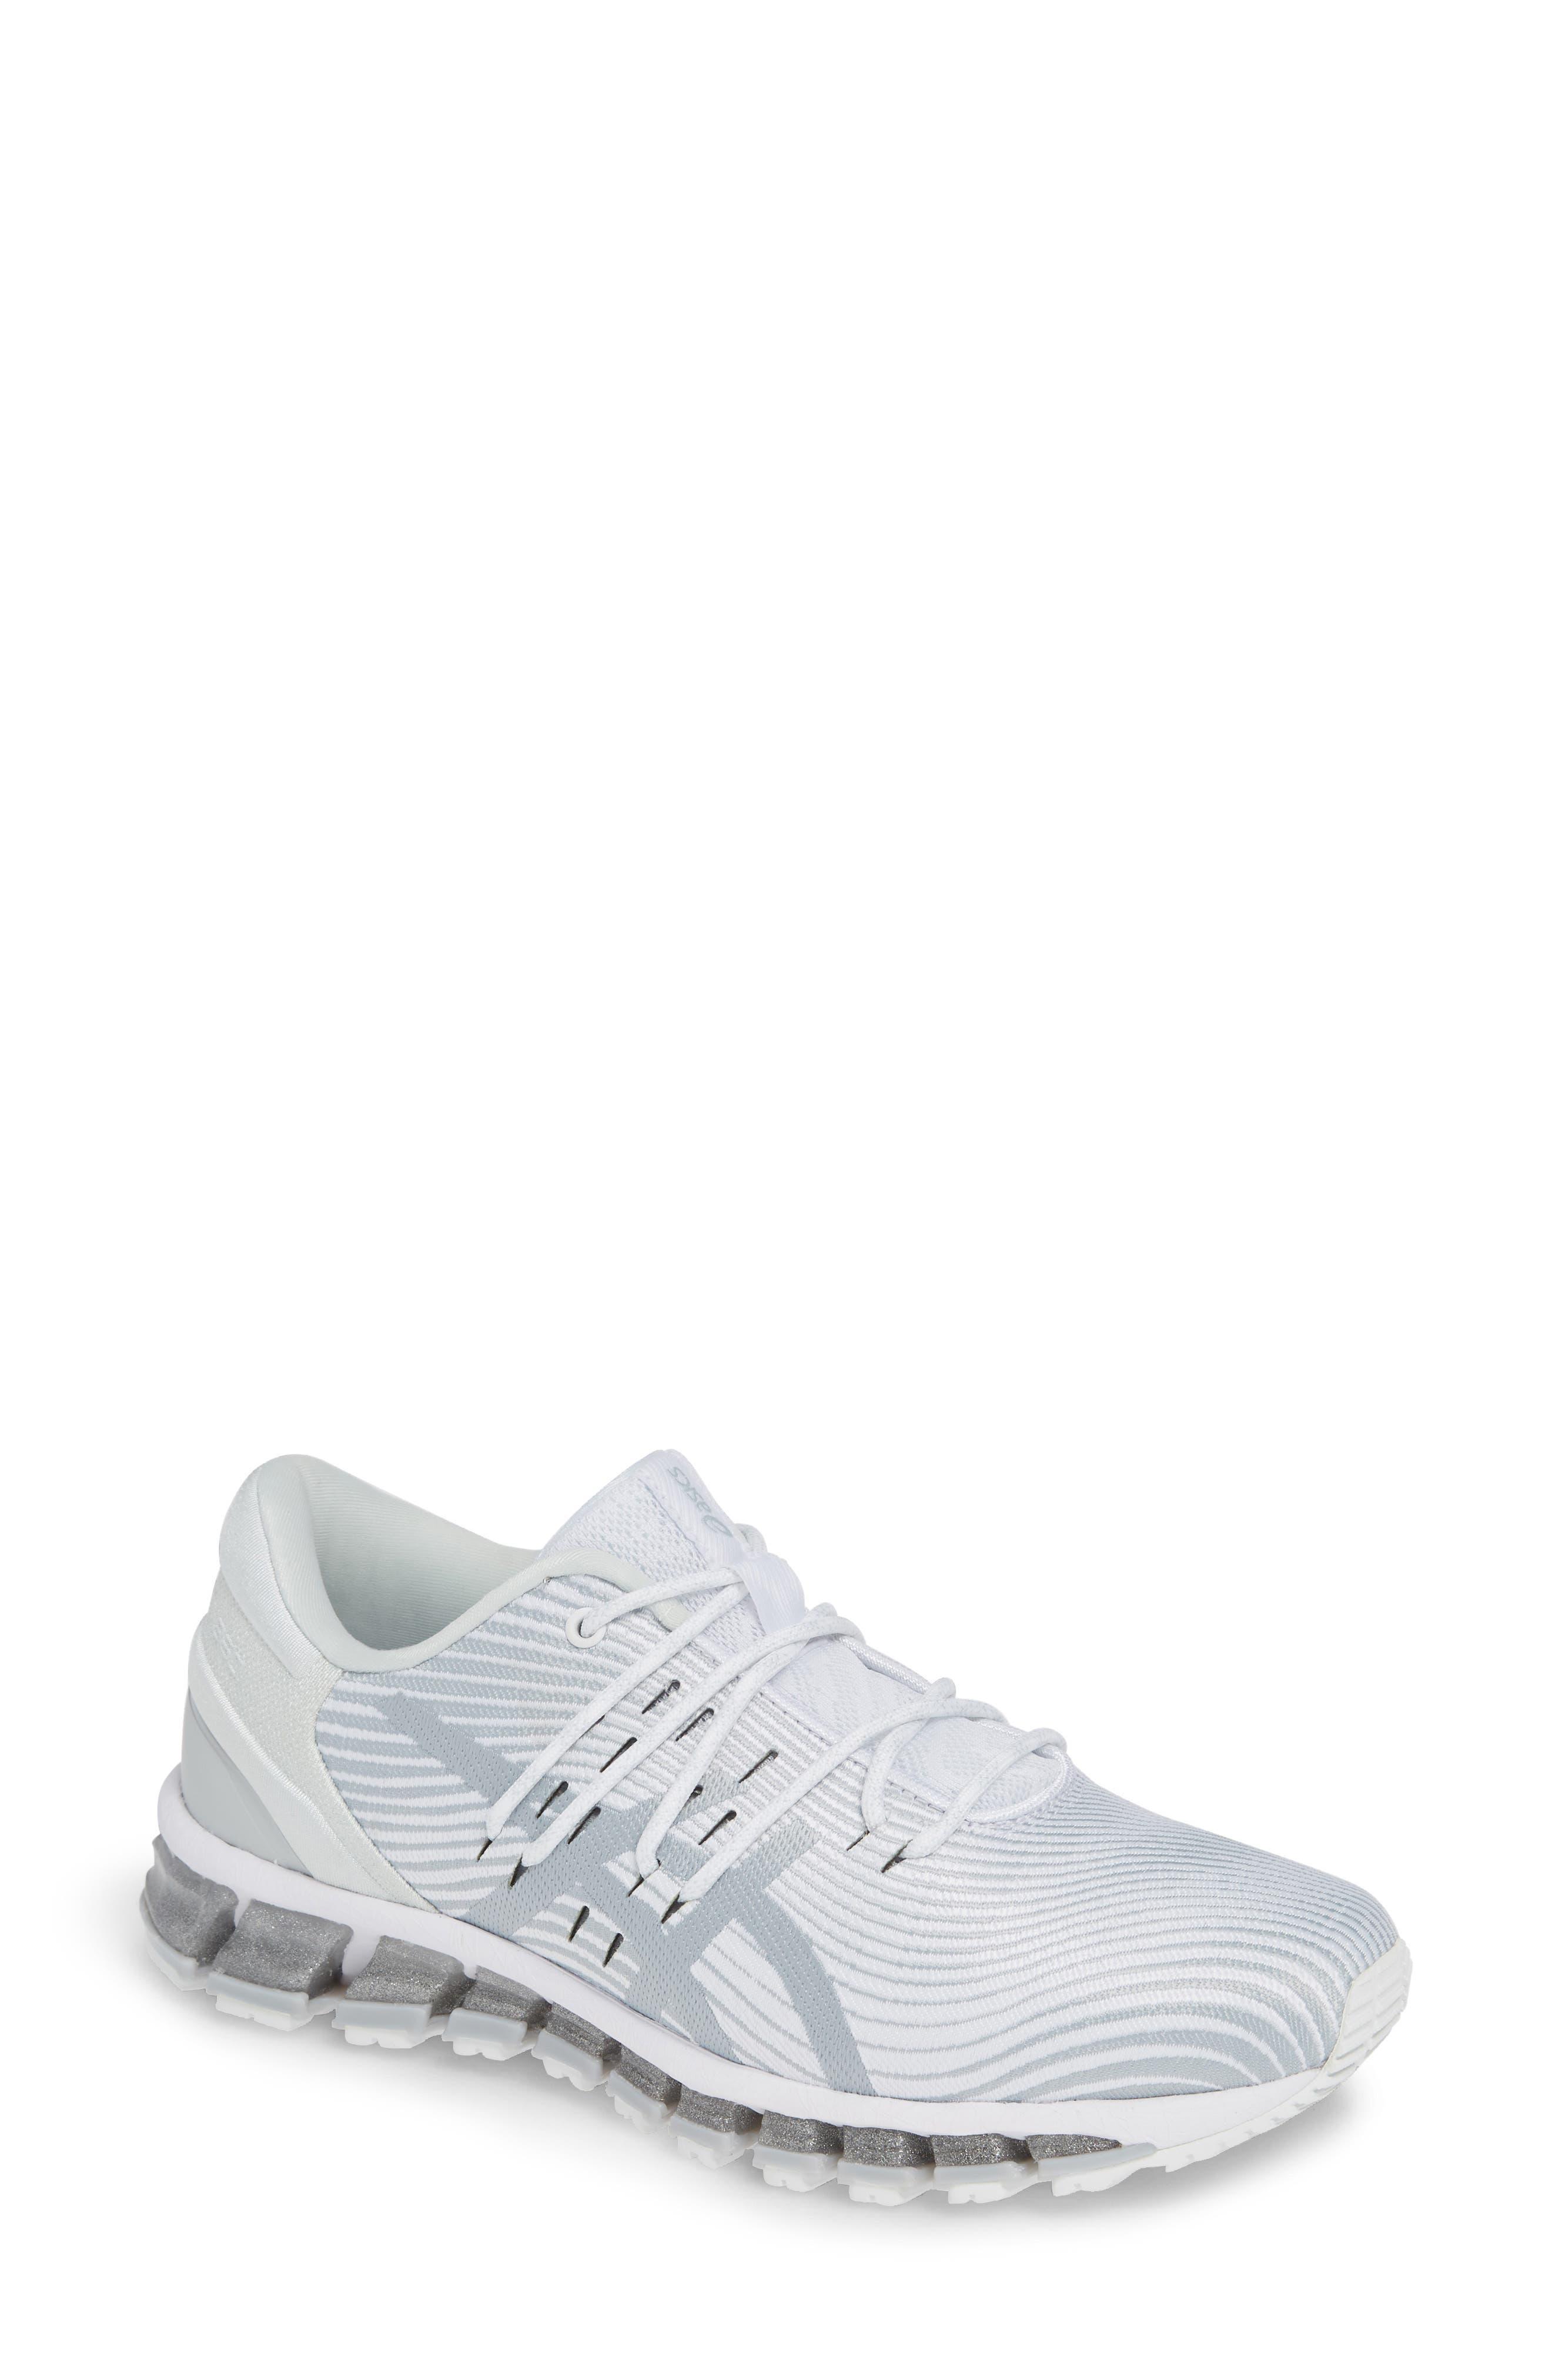 Asics Gel Quantum 360 4 Running Shoe B - White